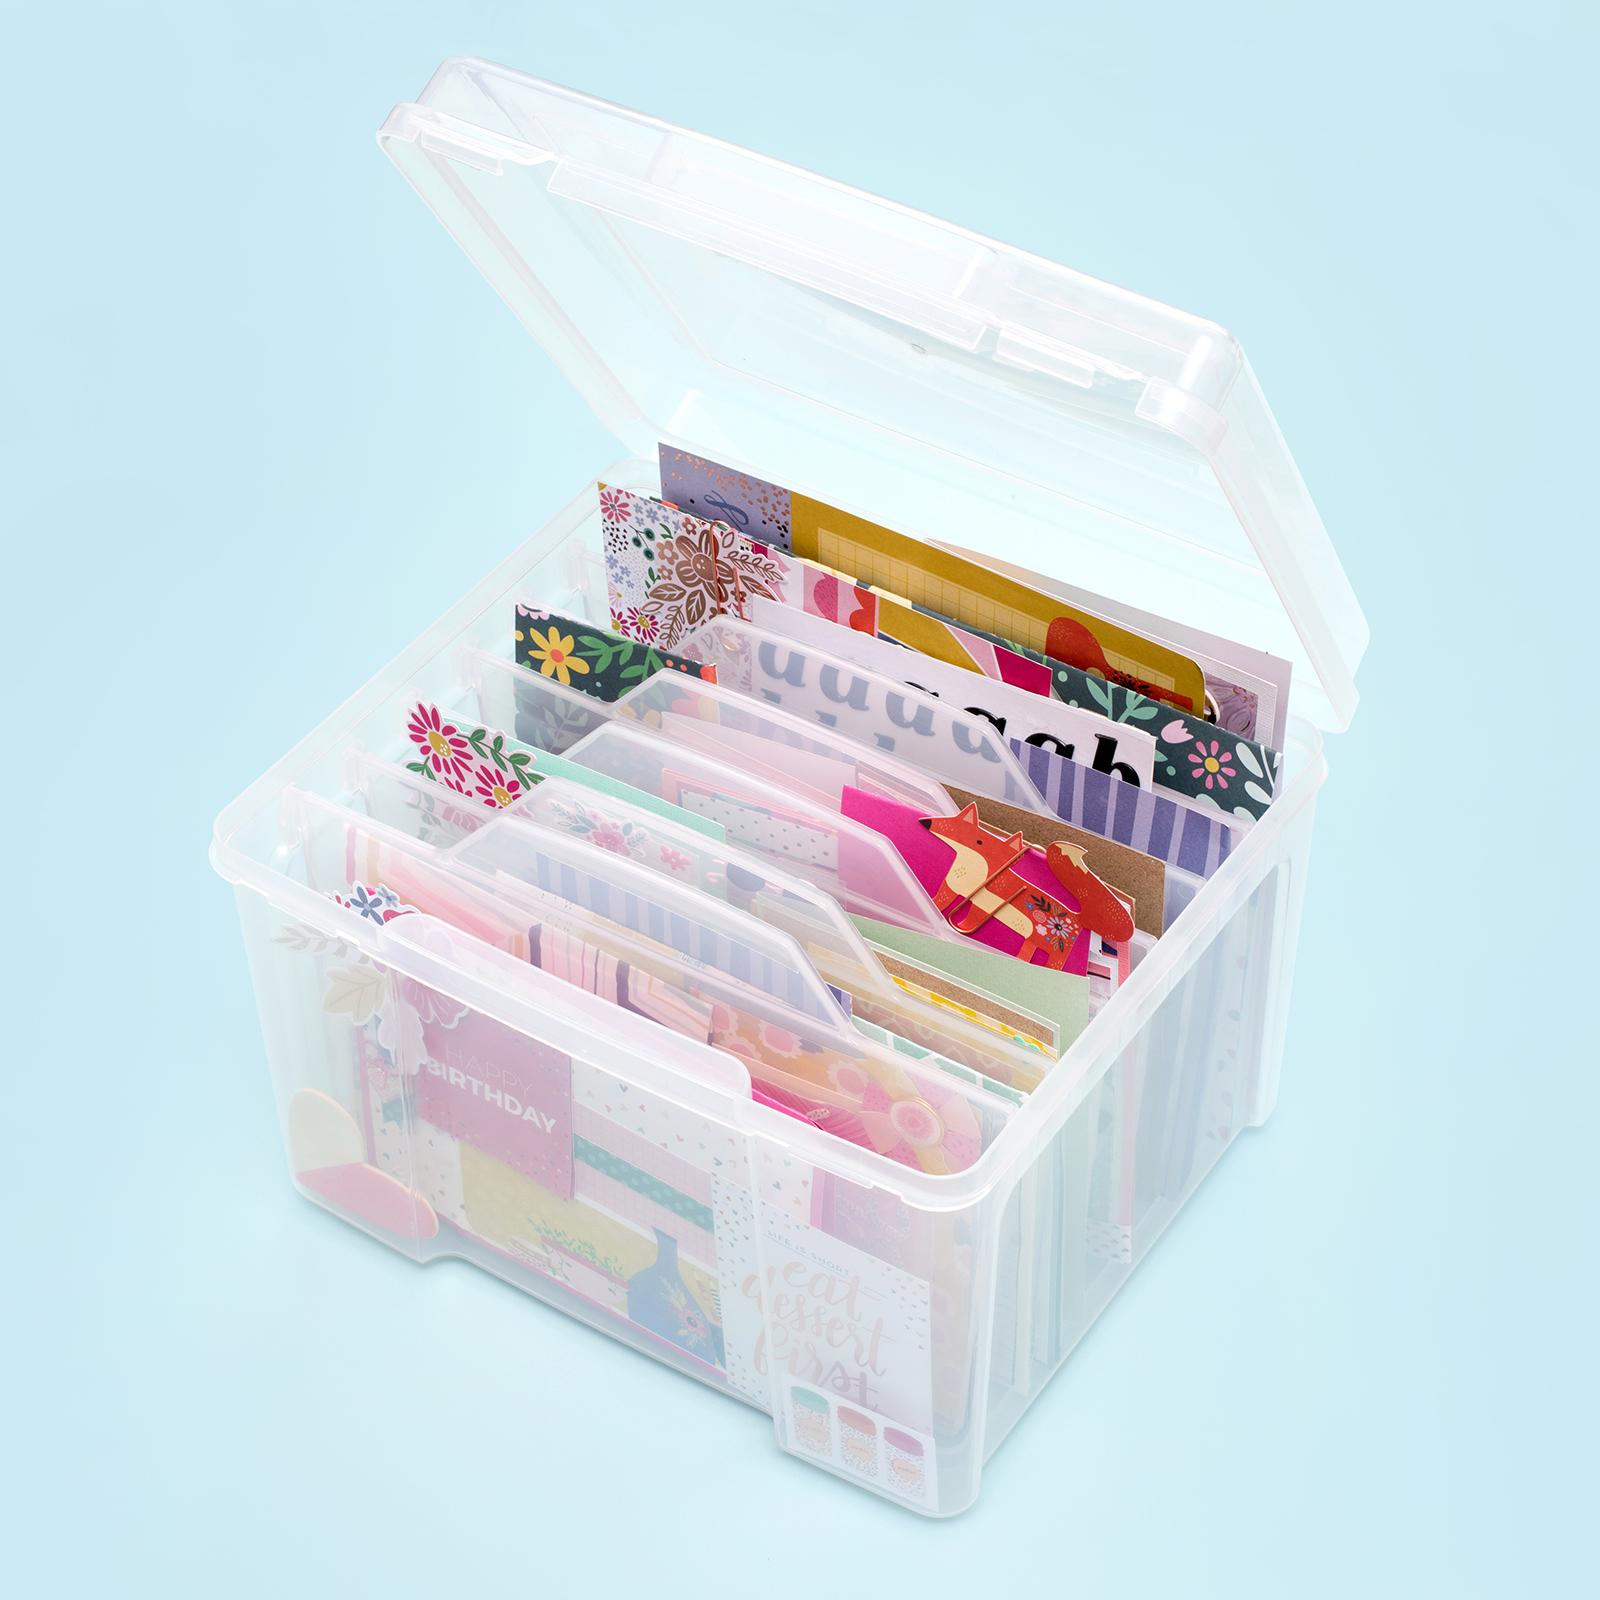 Merveilleux Craft Storage Bins By We R Memory Keepers